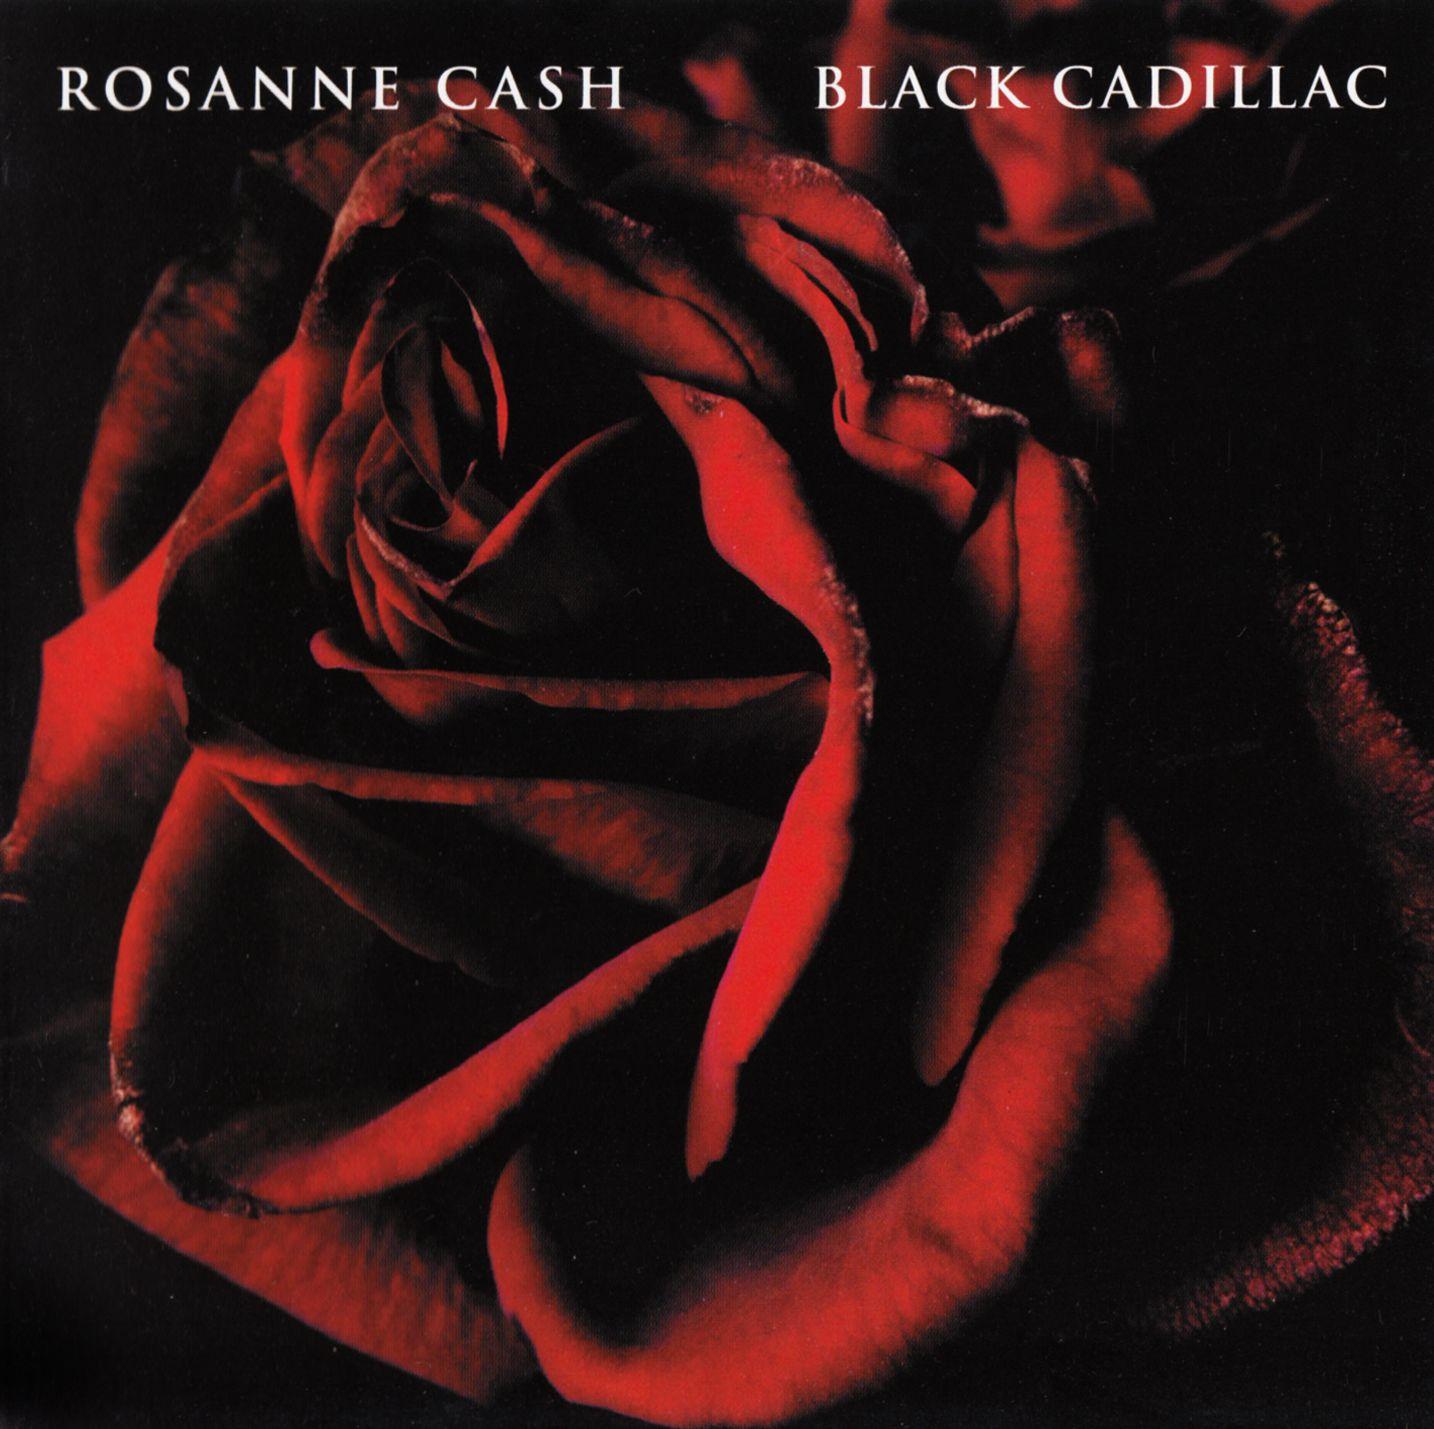 Rosanne Cash - Black Cadillac Album Cover